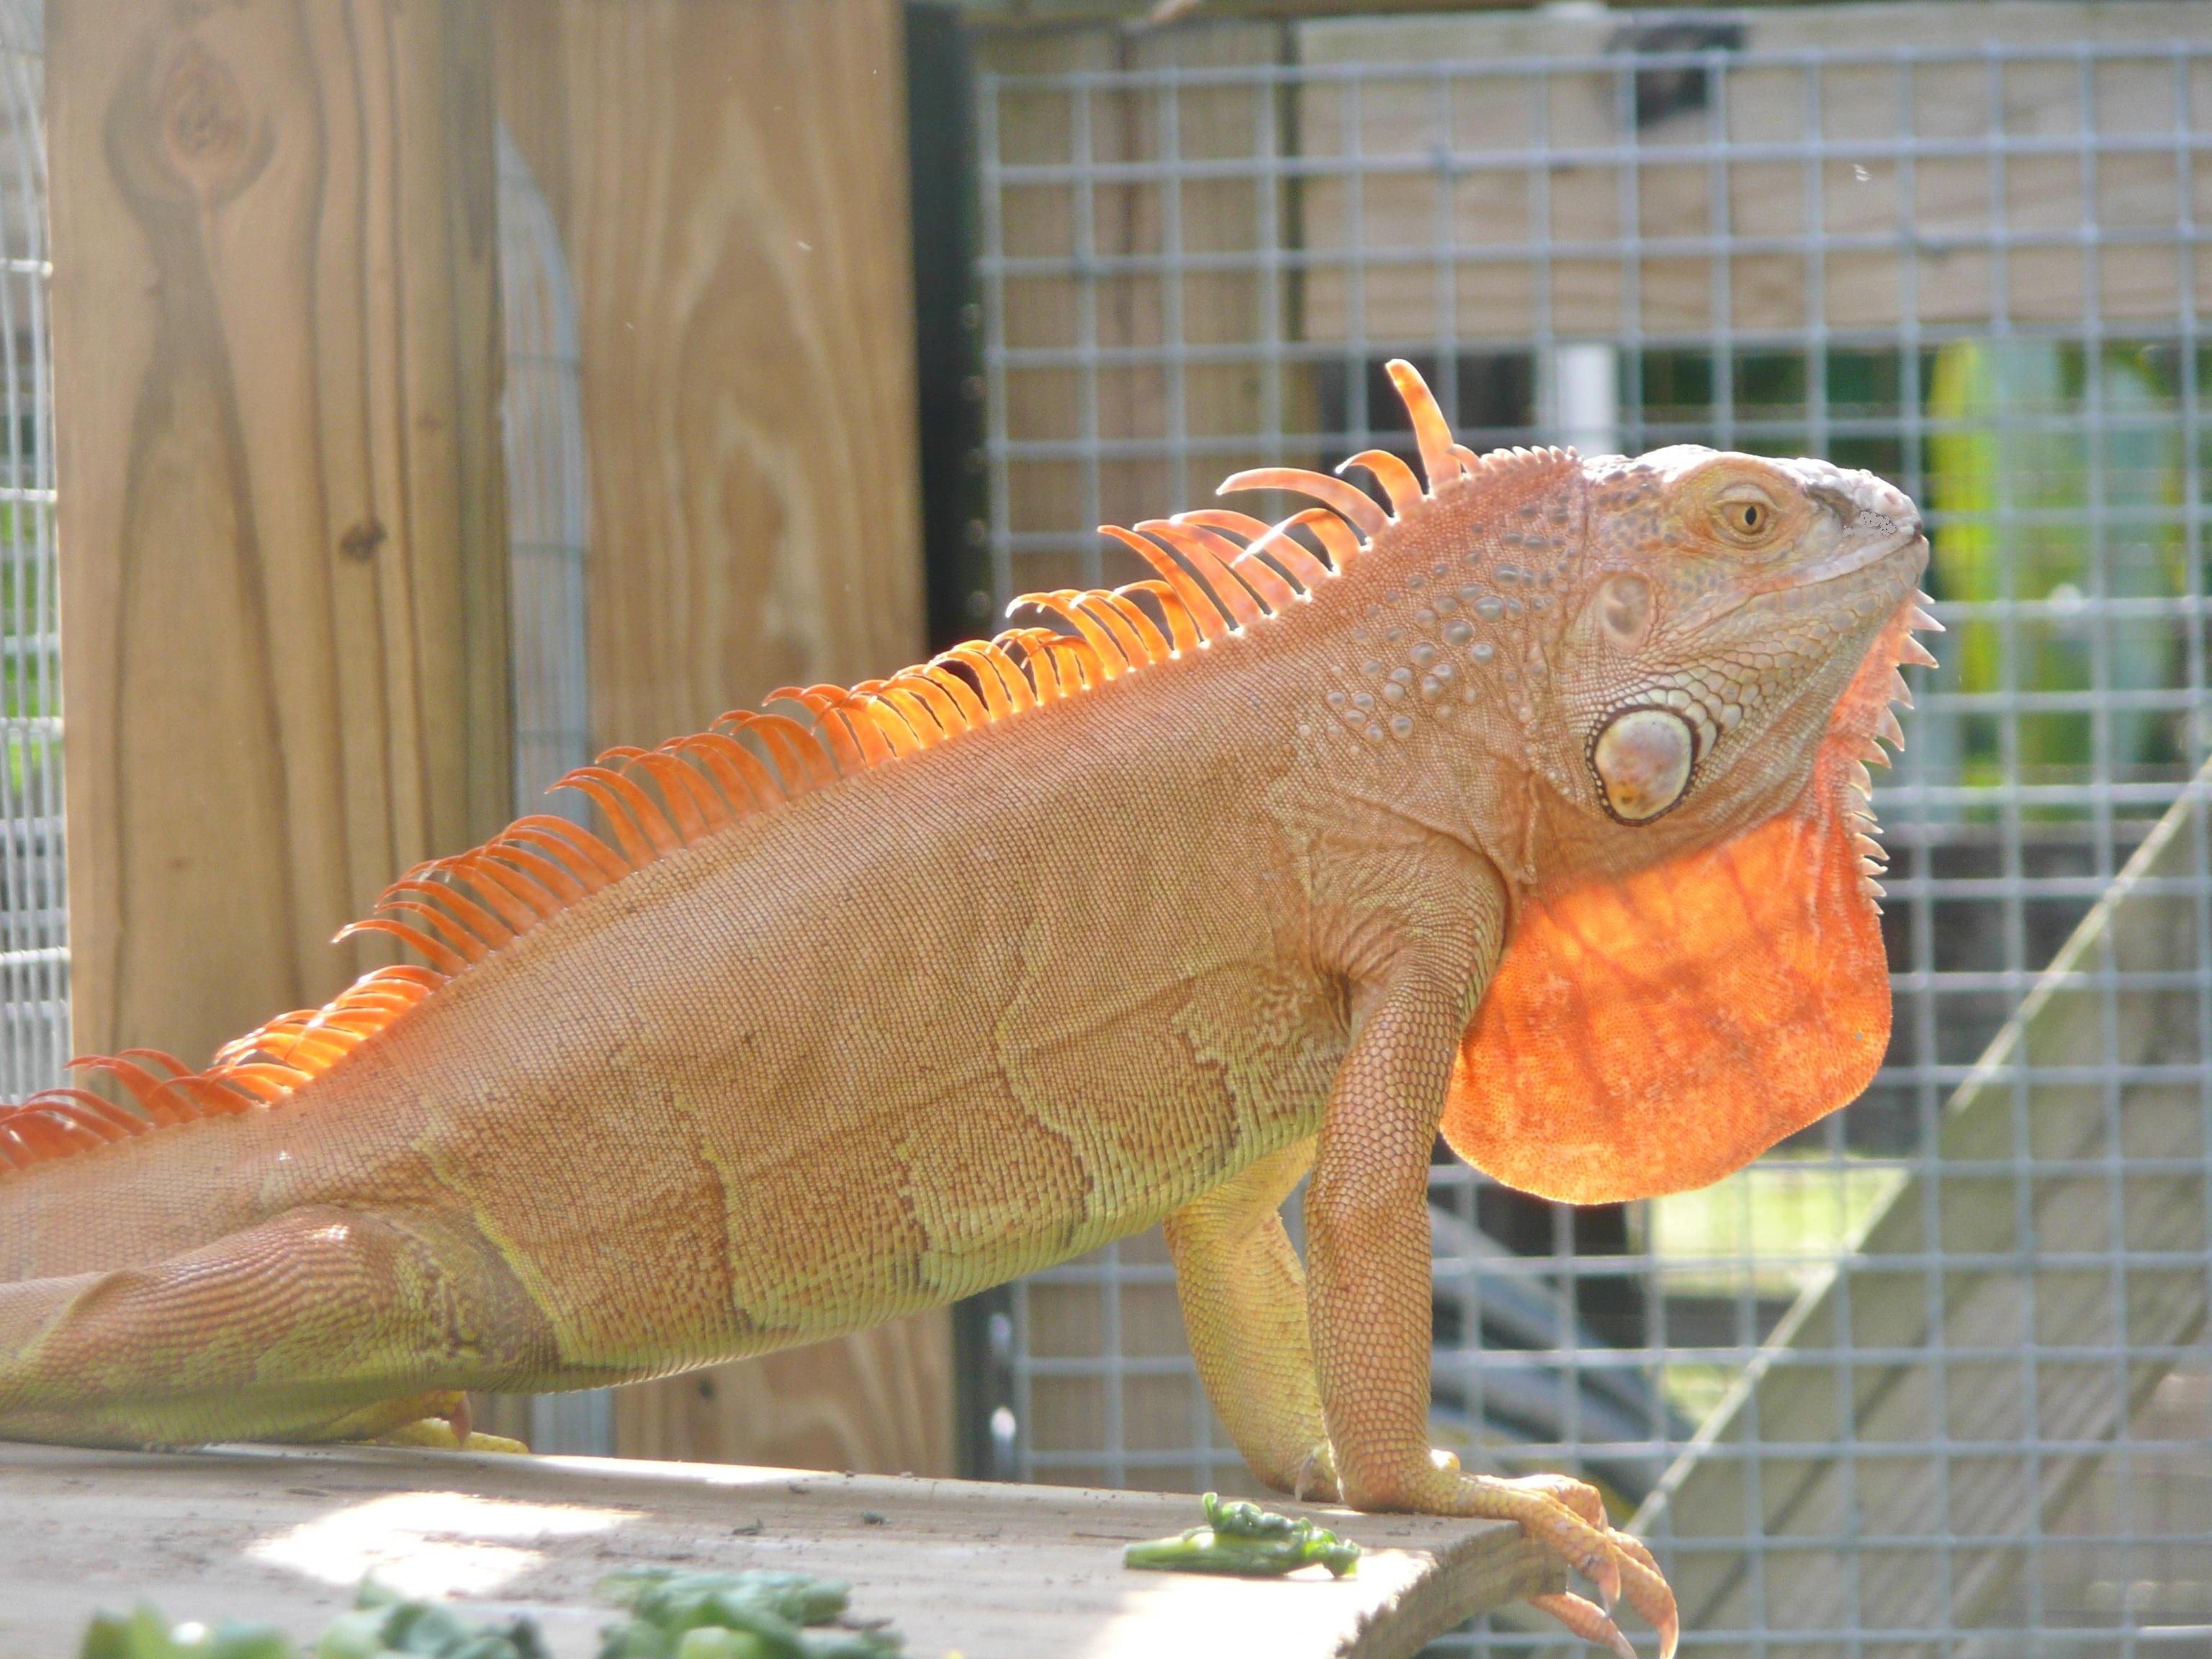 Iguanas Green Color Morphs Hypomelanistic Red Cross